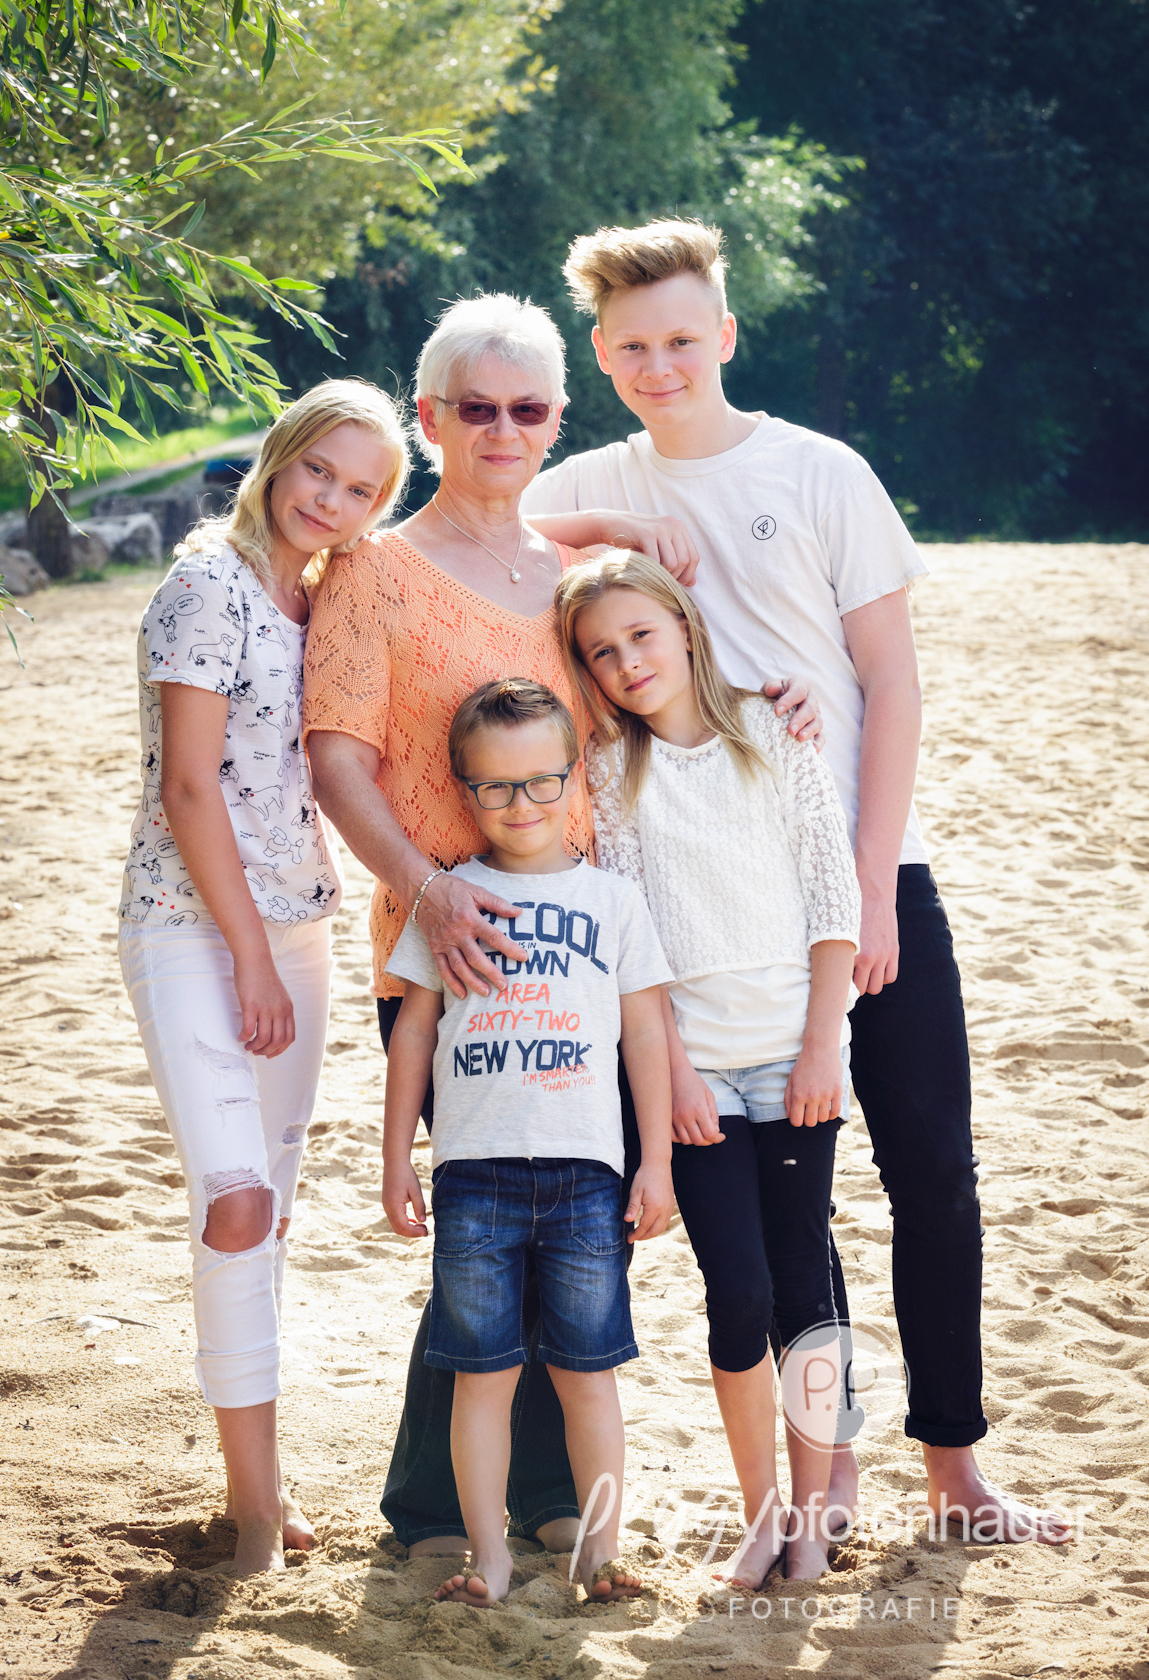 Familienphotografie Bayern